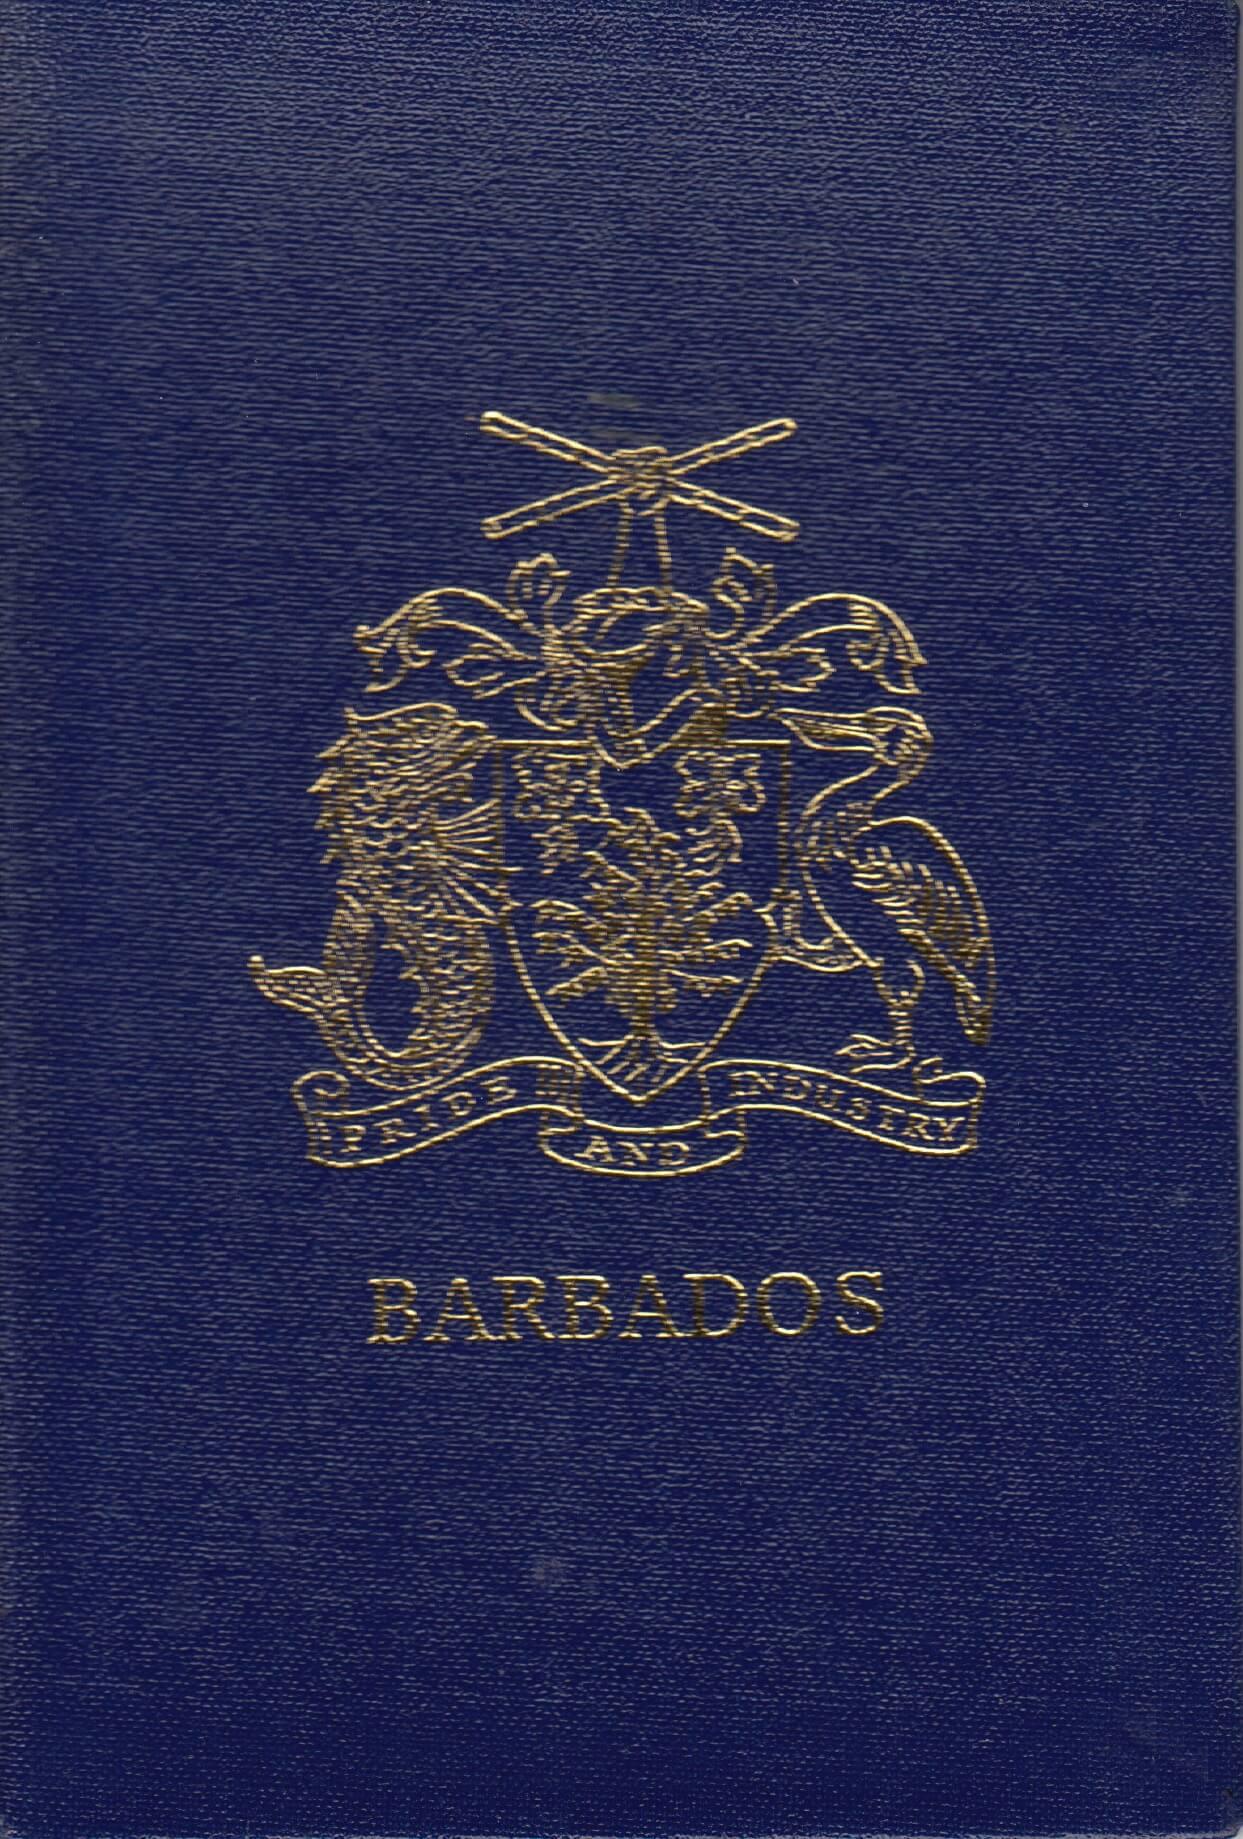 XVIIIth Congress of the Universal Postal Union, Rio de Janeiro 1979 - Barbados stamp booklet cover